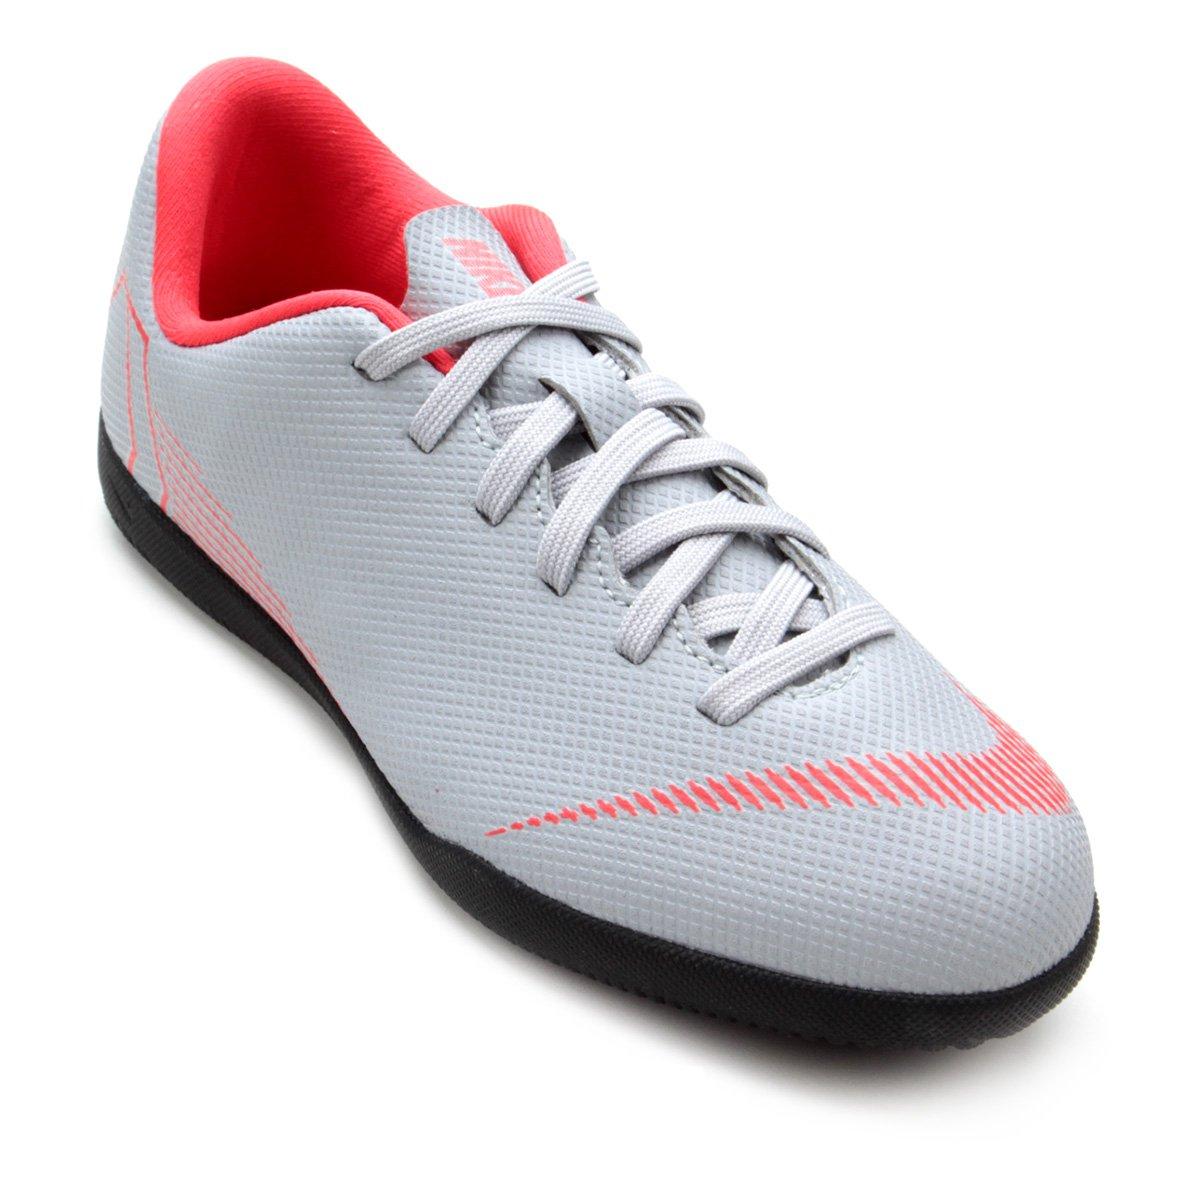 41c52daa72 Chuteira Futsal Infantil Nike Mercurial Vapor 12 Club - Cinza ...